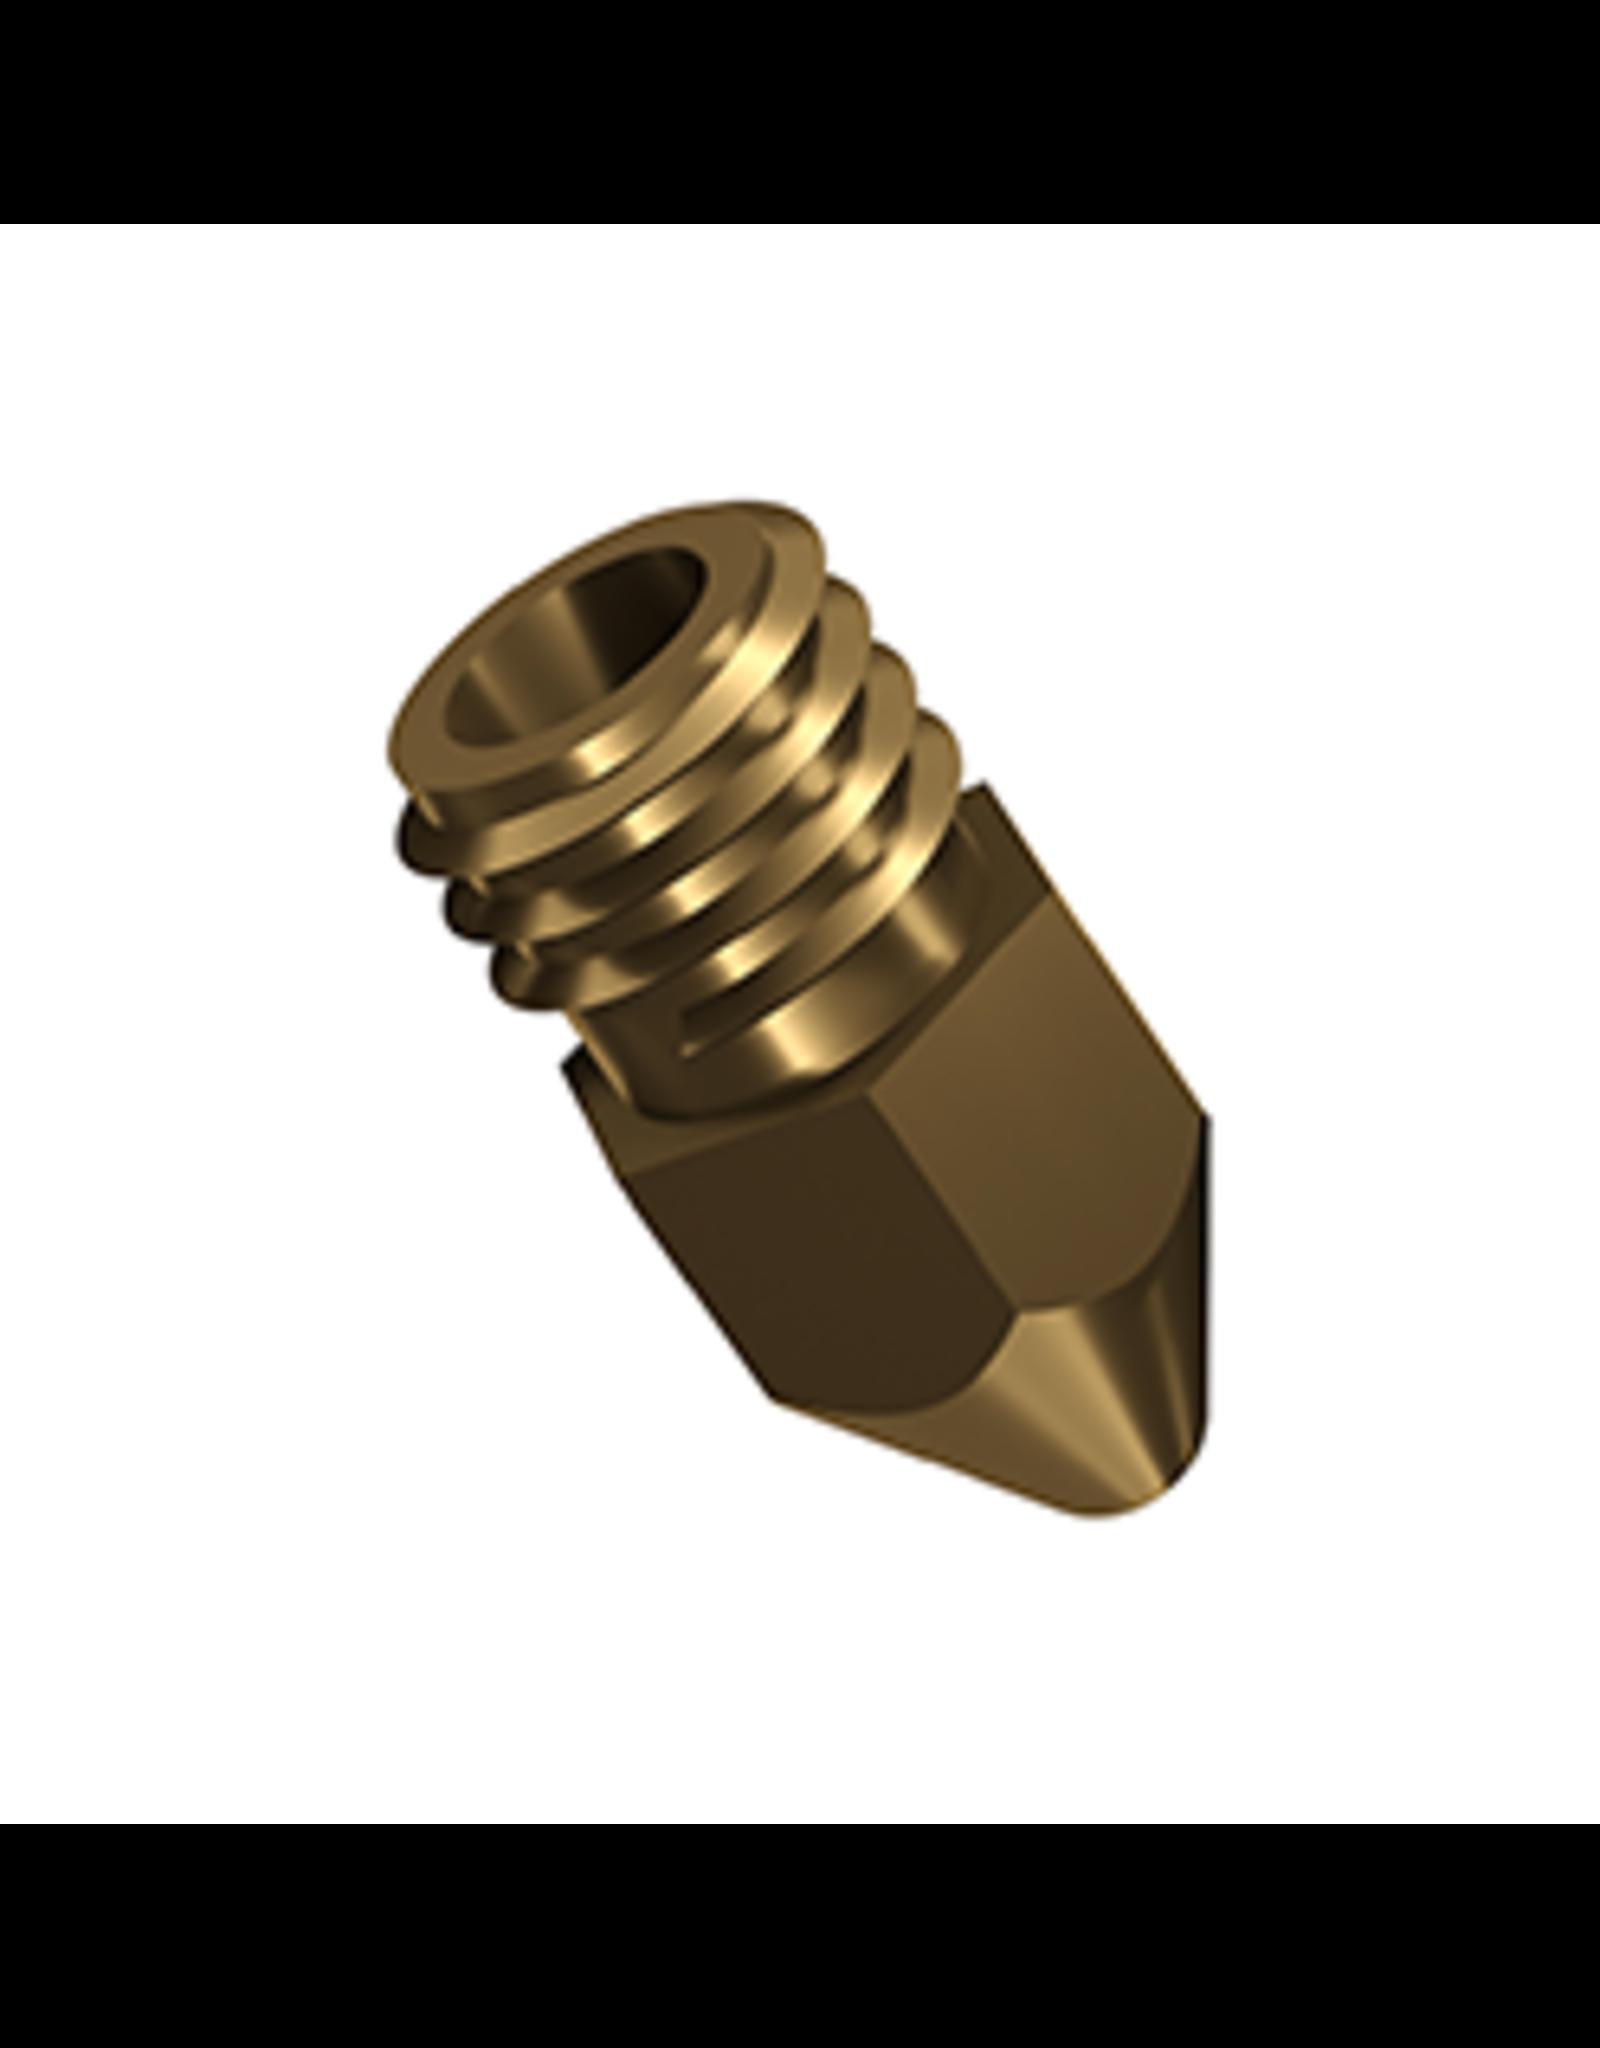 Zortrax Zortrax Nozzle for M200 & M300 0,4 mm